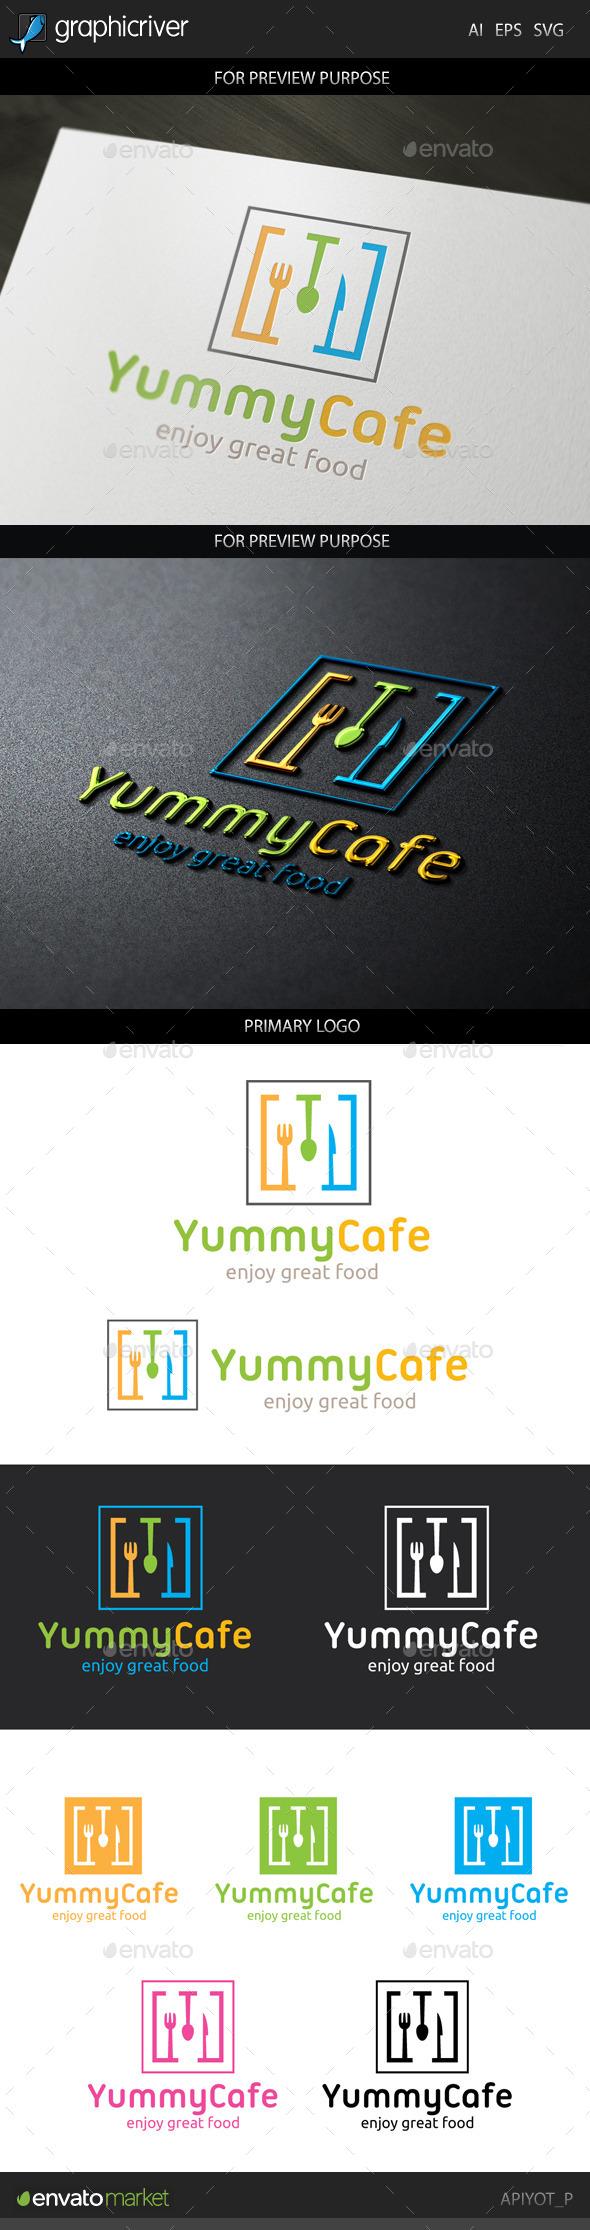 Yummy Cafe Logo